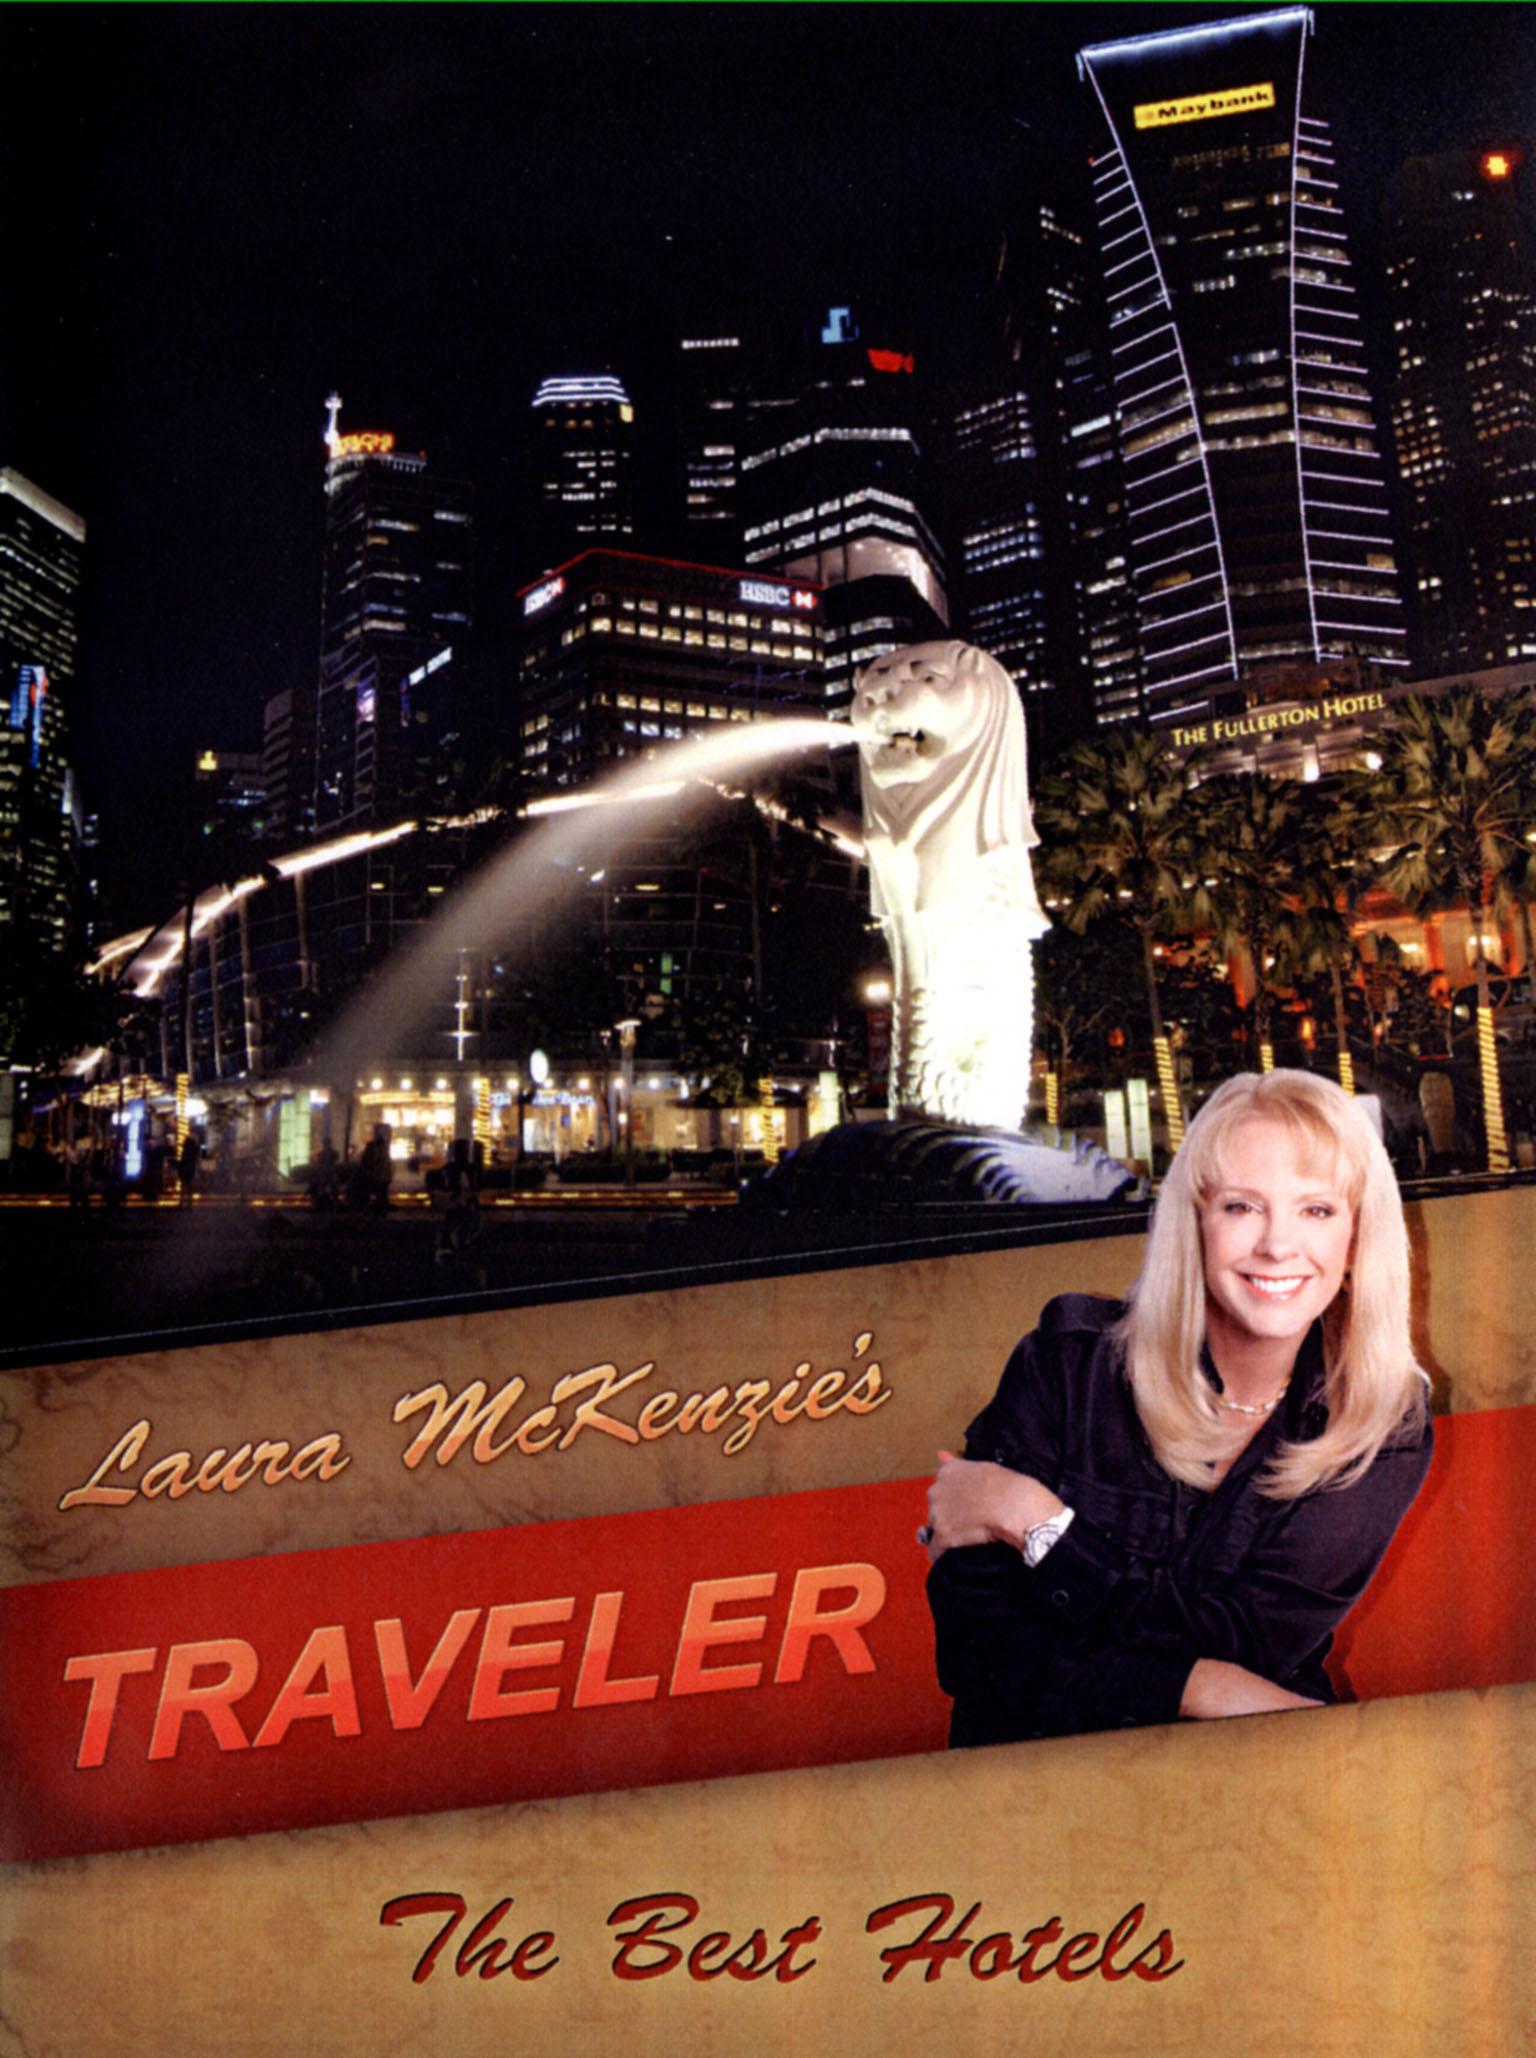 Laura McKenzie's Traveler: The Best Hotels